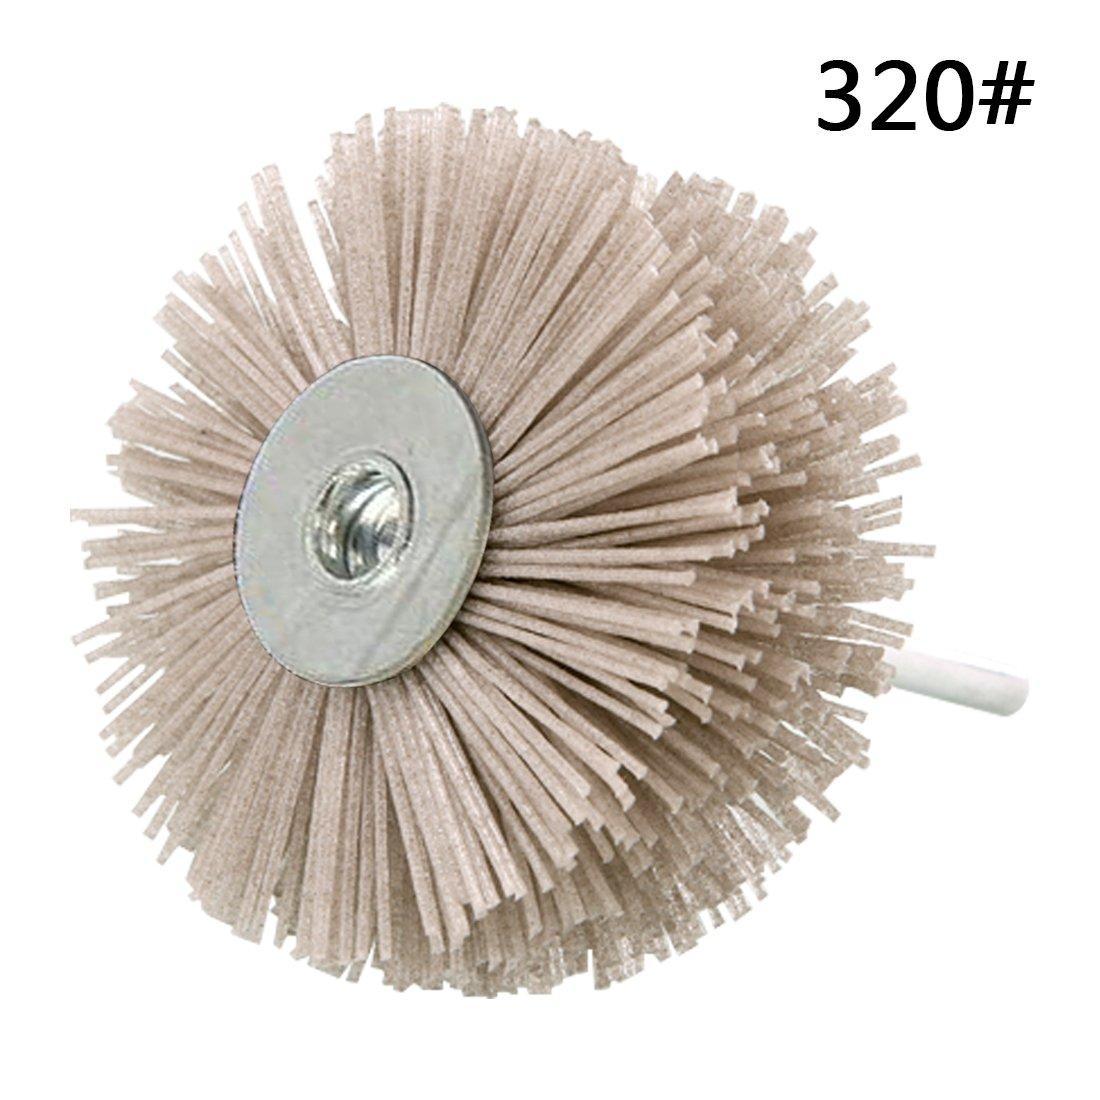 Abrasive Nylon Rad Pinsel Radial Polierb/ürste f/ür Holz M/öbel Mahagoni Finishing Metall Stein ODOD85mm 1 St/ück Grau 240#